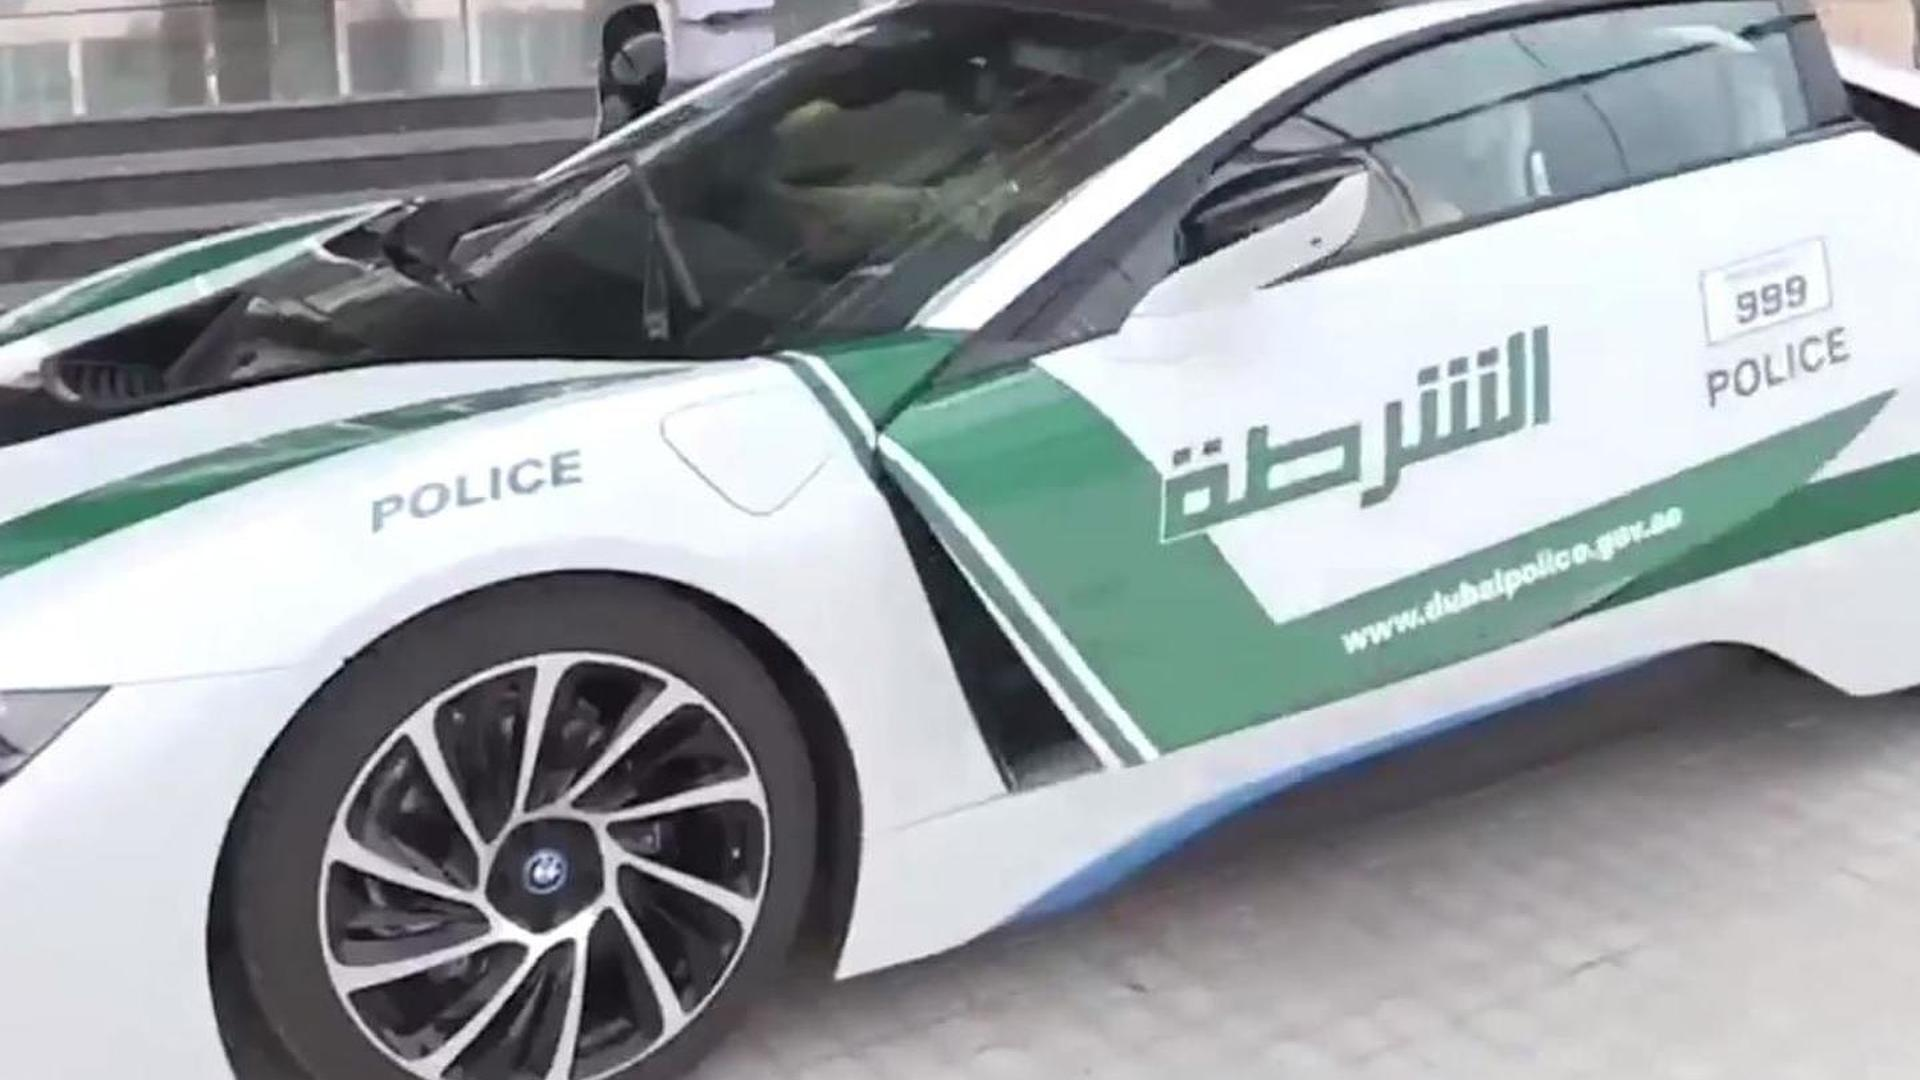 Dubai police fleet expands with BMW i8 [video]